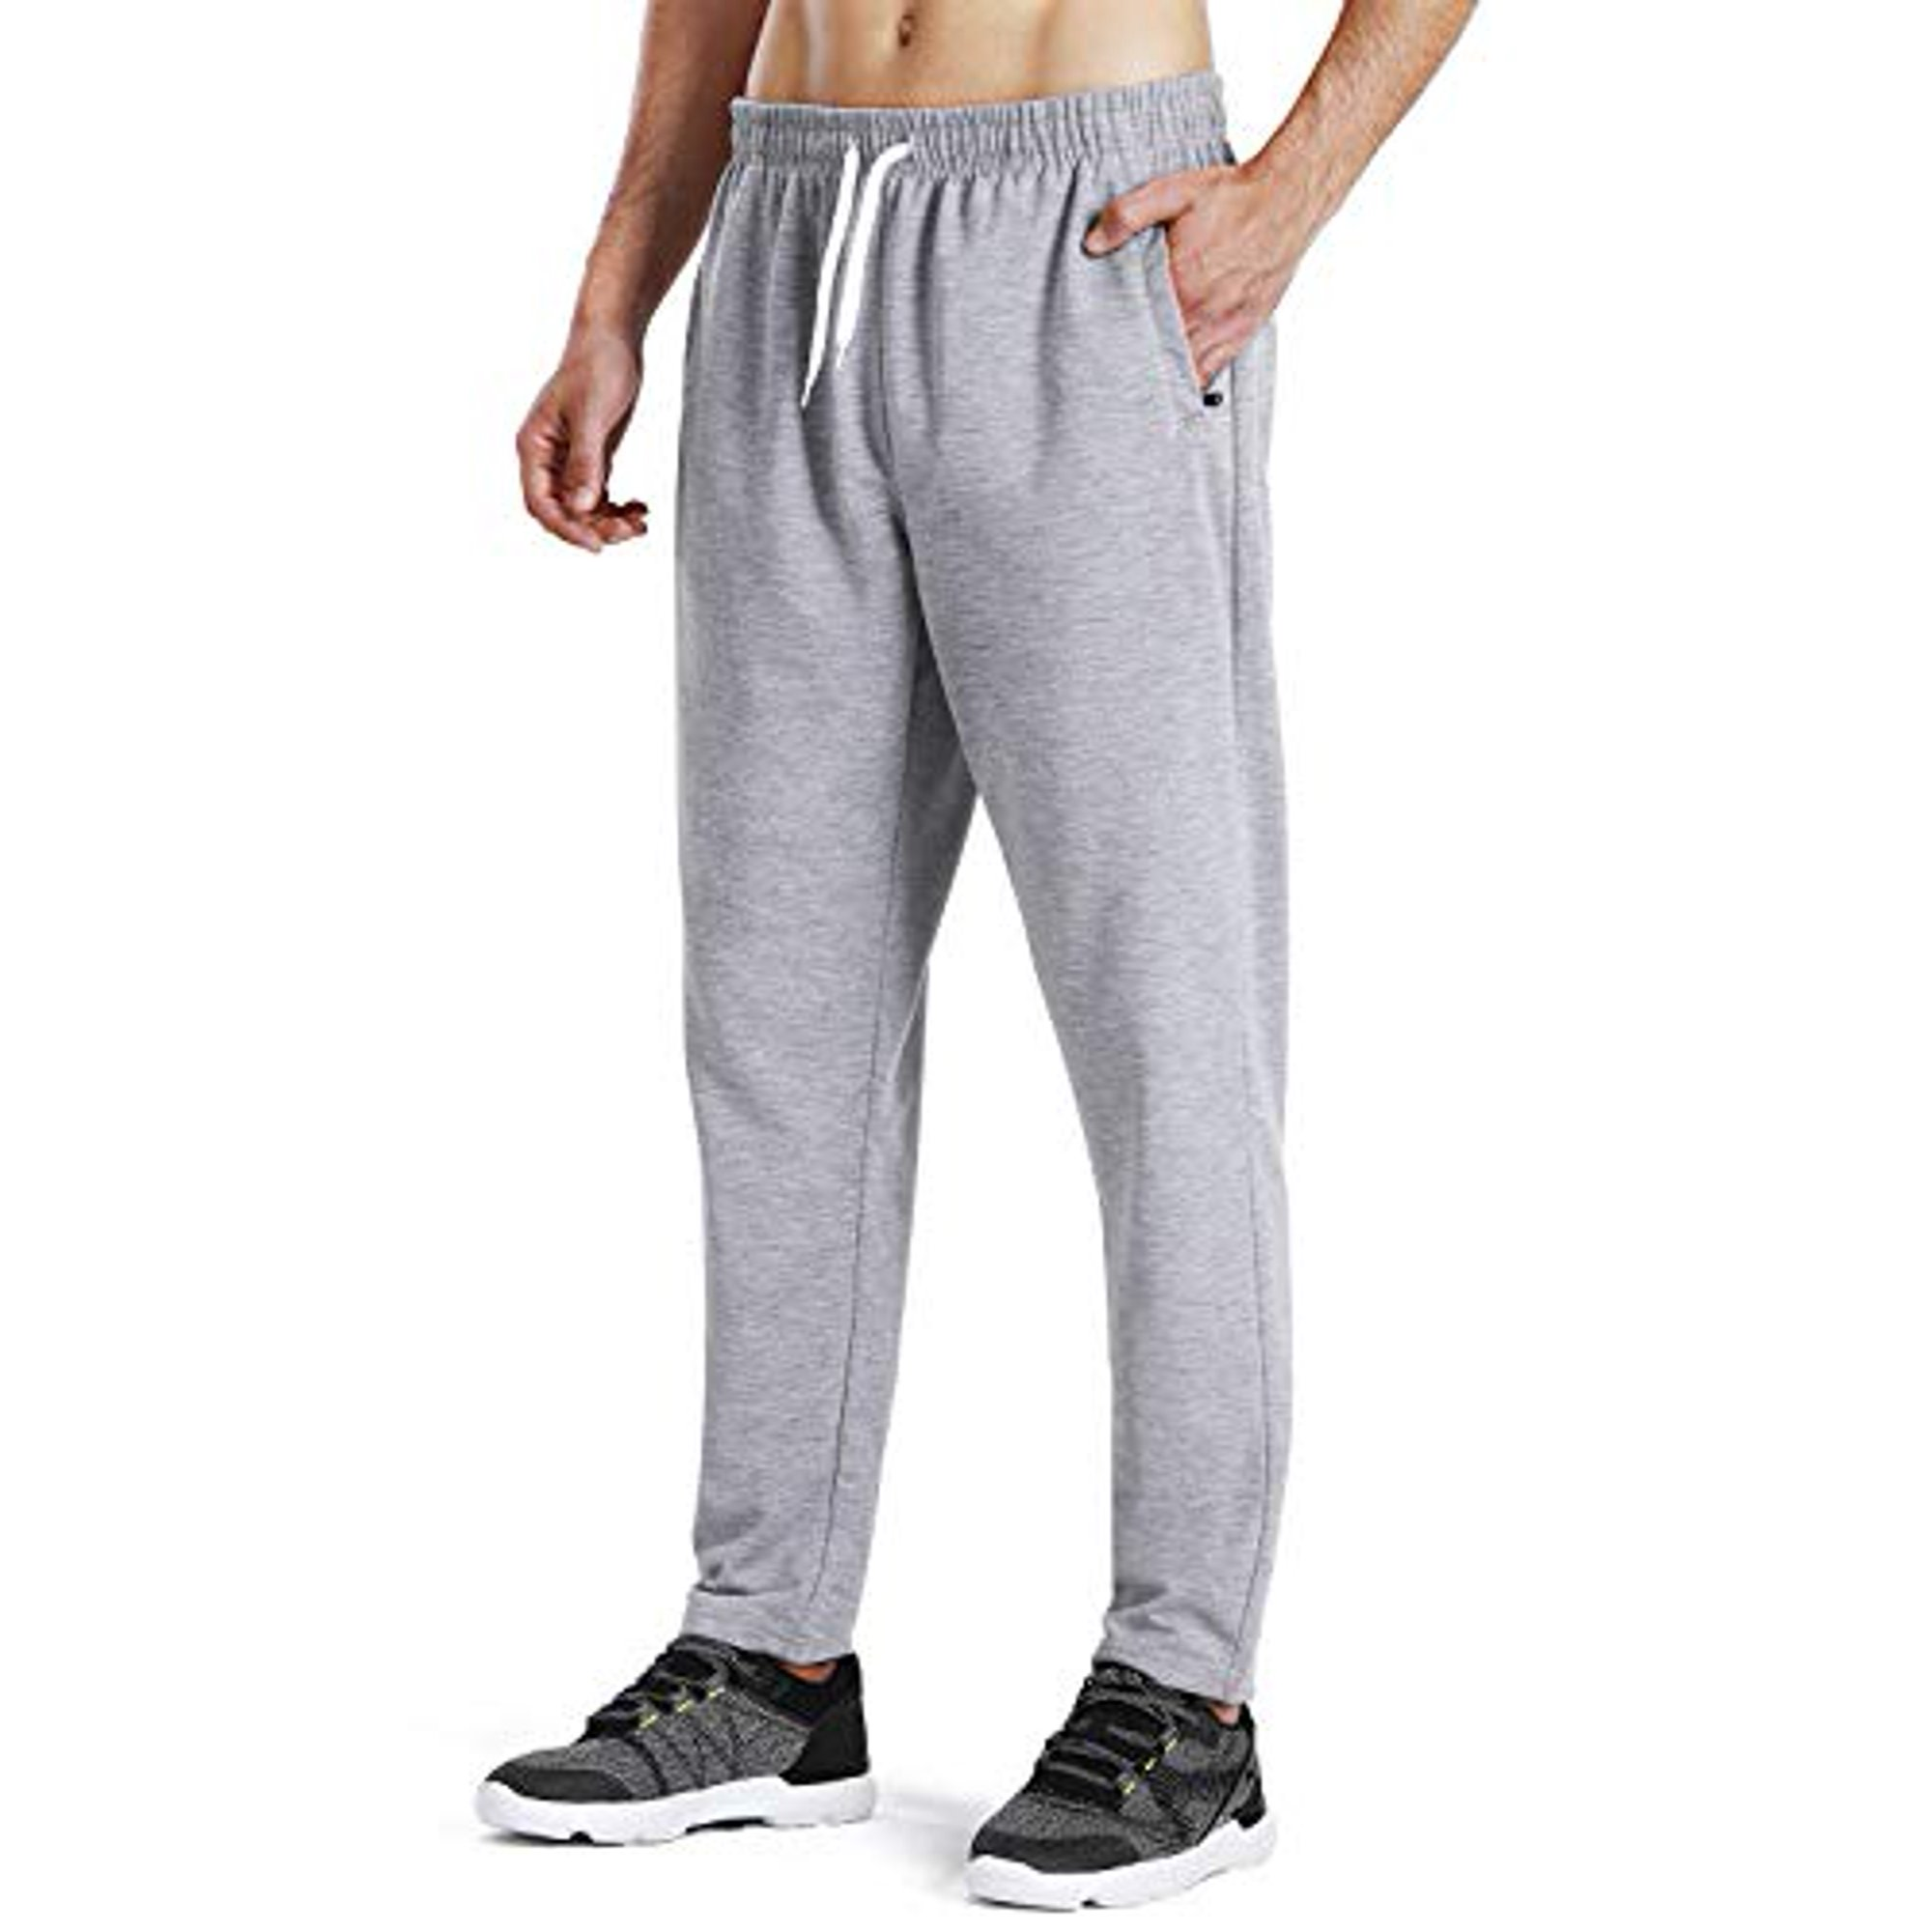 NAVISKIN Men's Athletic Running Pants Workout Training Pants Zip Pockets  Light Grey Size S | Walmart Canada